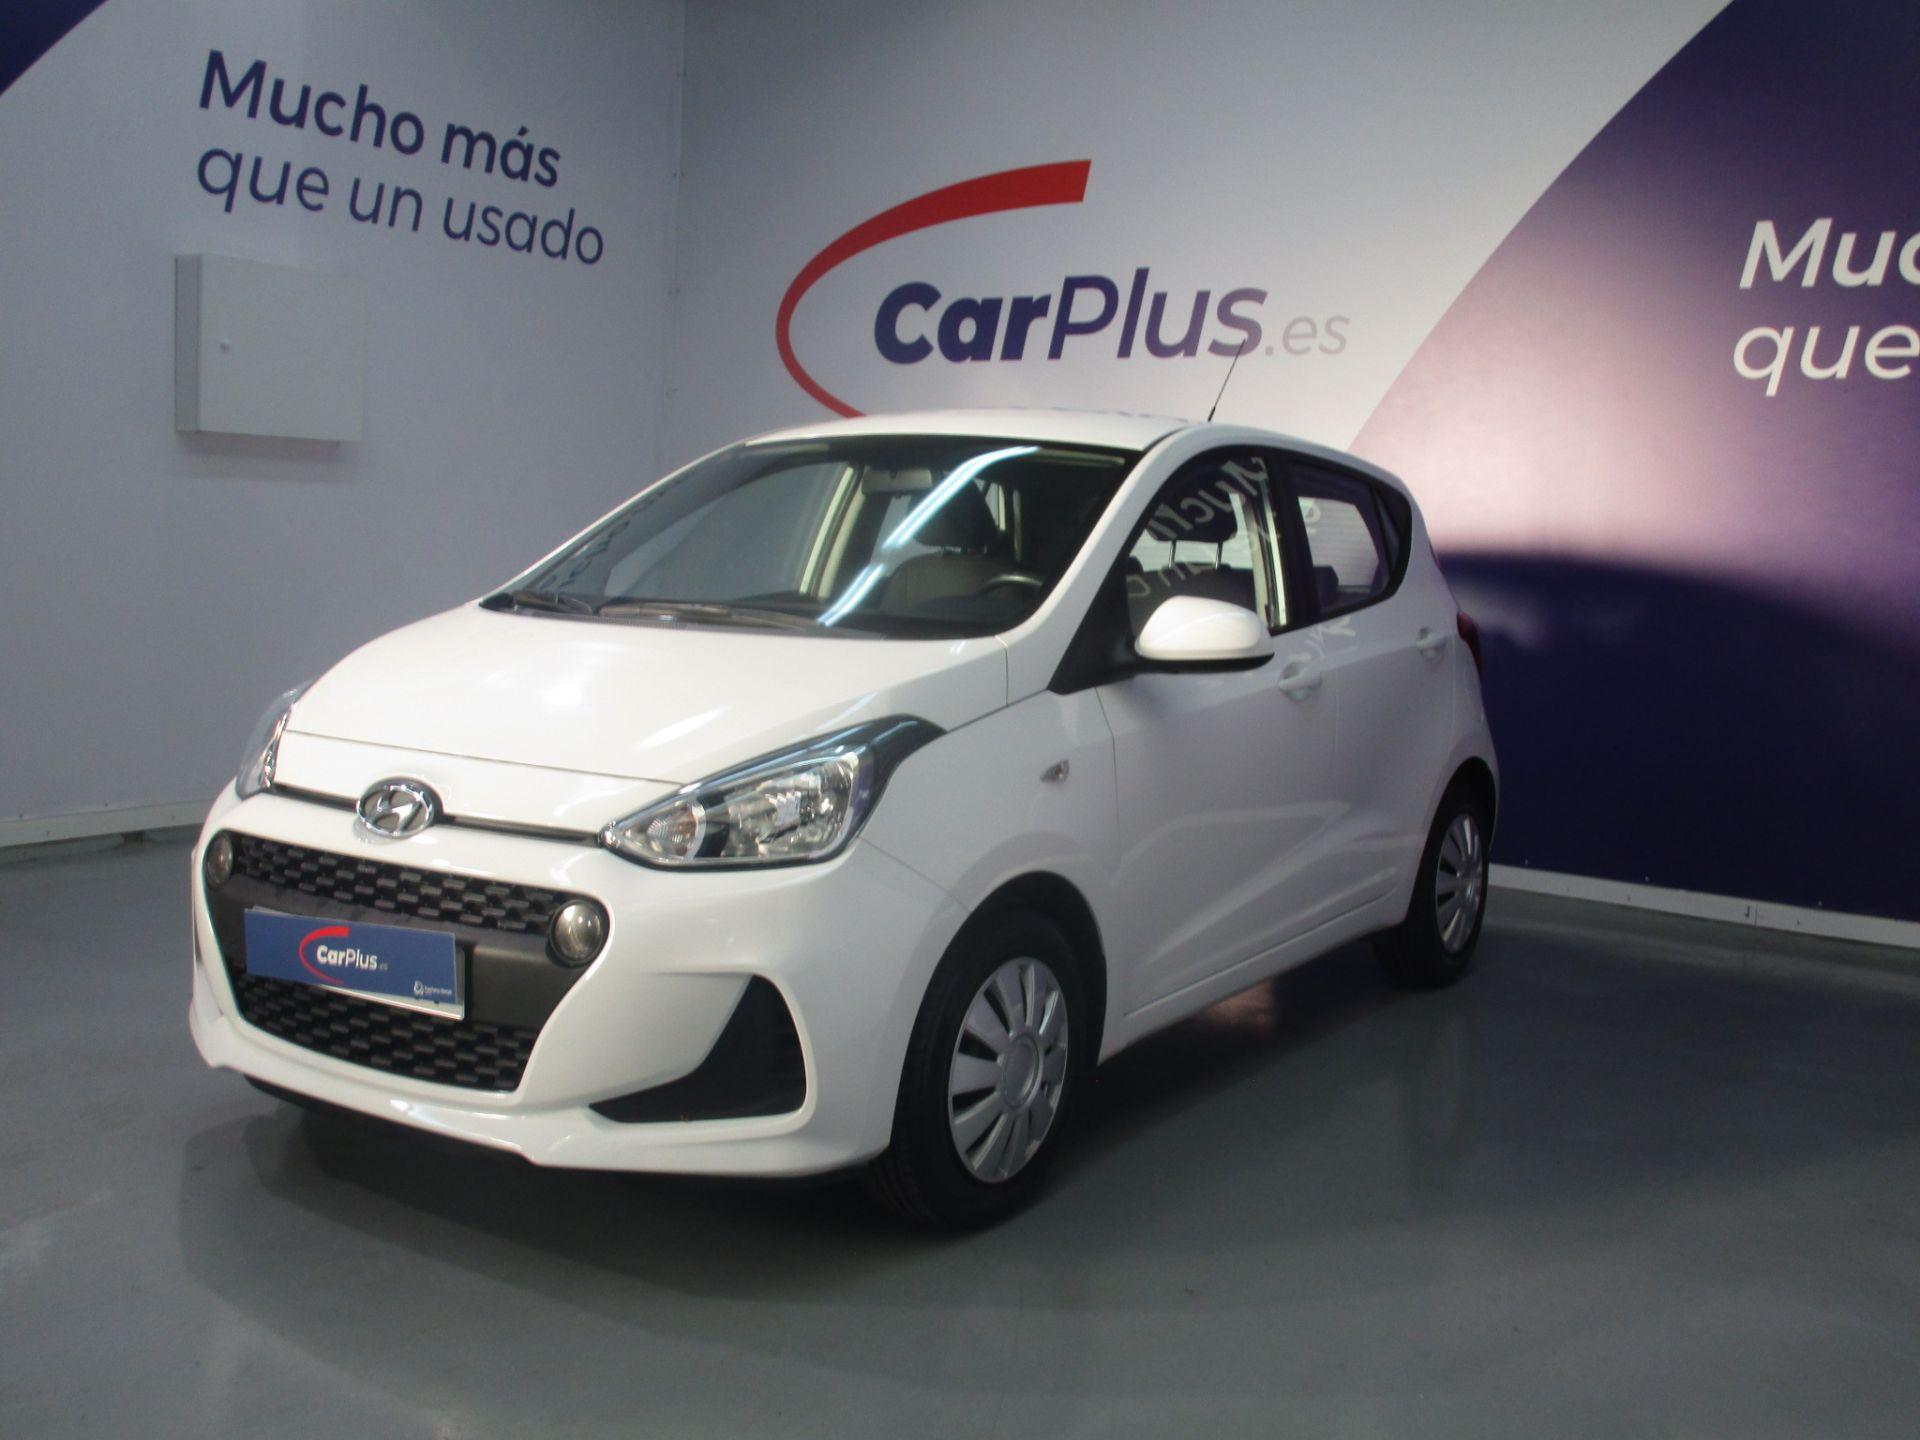 Hyundai i10 1.0 Autogas segunda mano Madrid